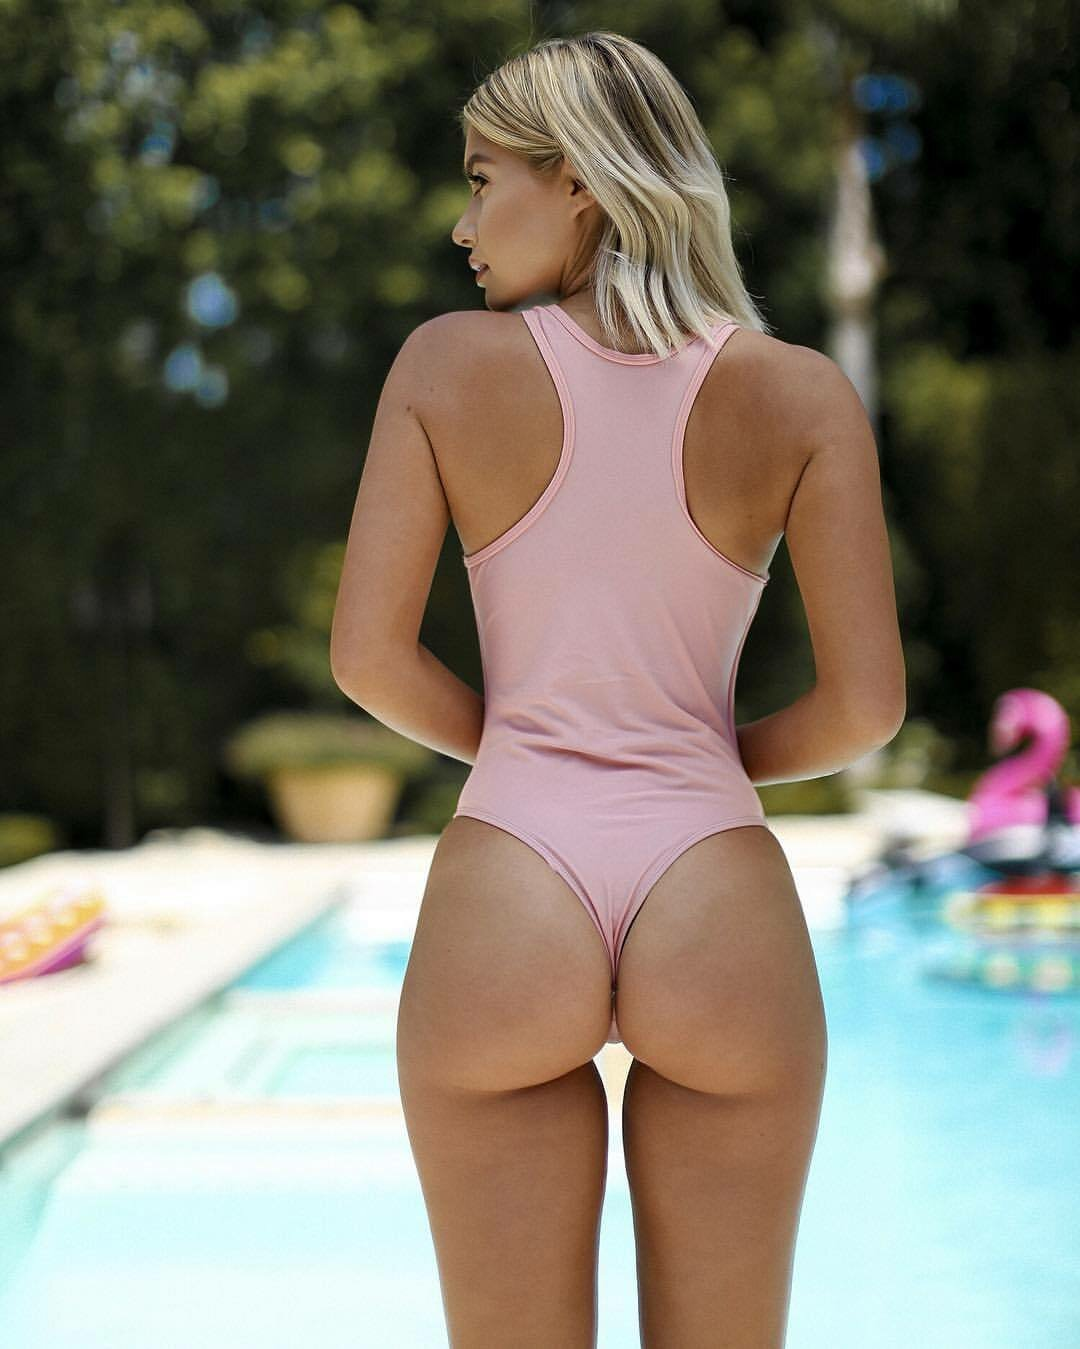 Teen girl buttocks — pic 15